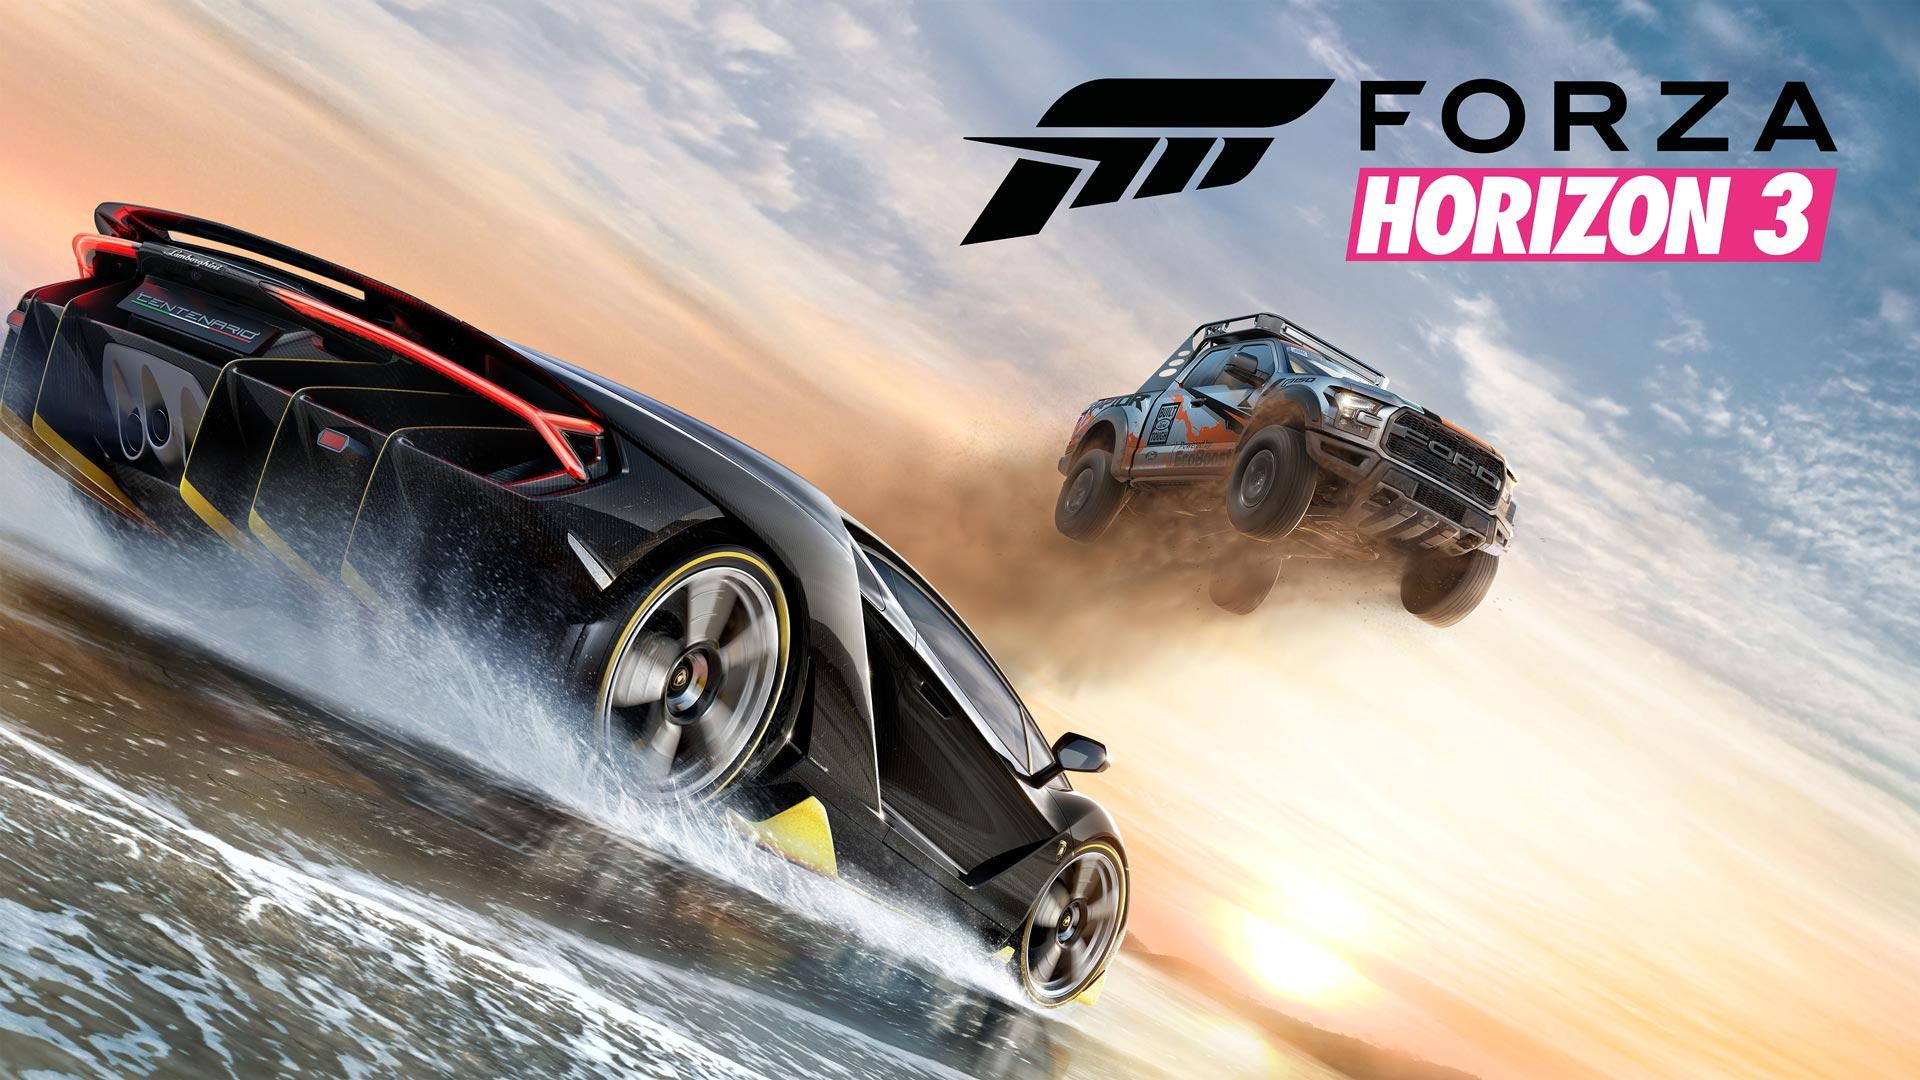 Forza Horizon 3 breaks striking milestone